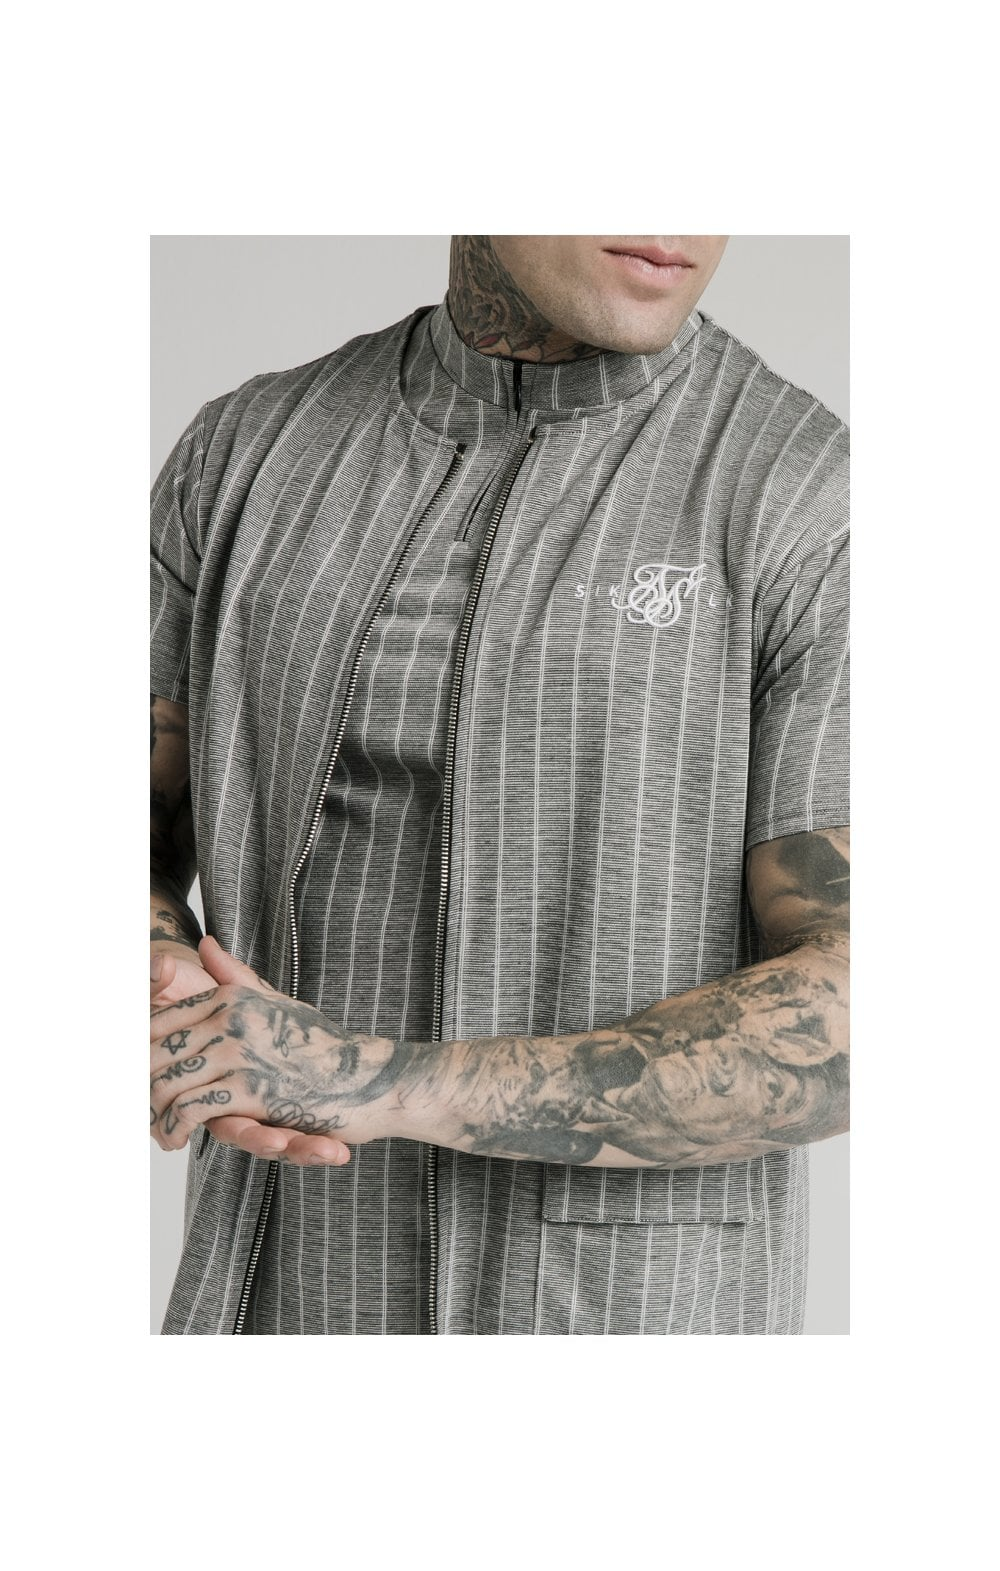 SikSilk Smart Wear Vest - Grey Pin Stripe MEN SIZES TOP: Extra Large